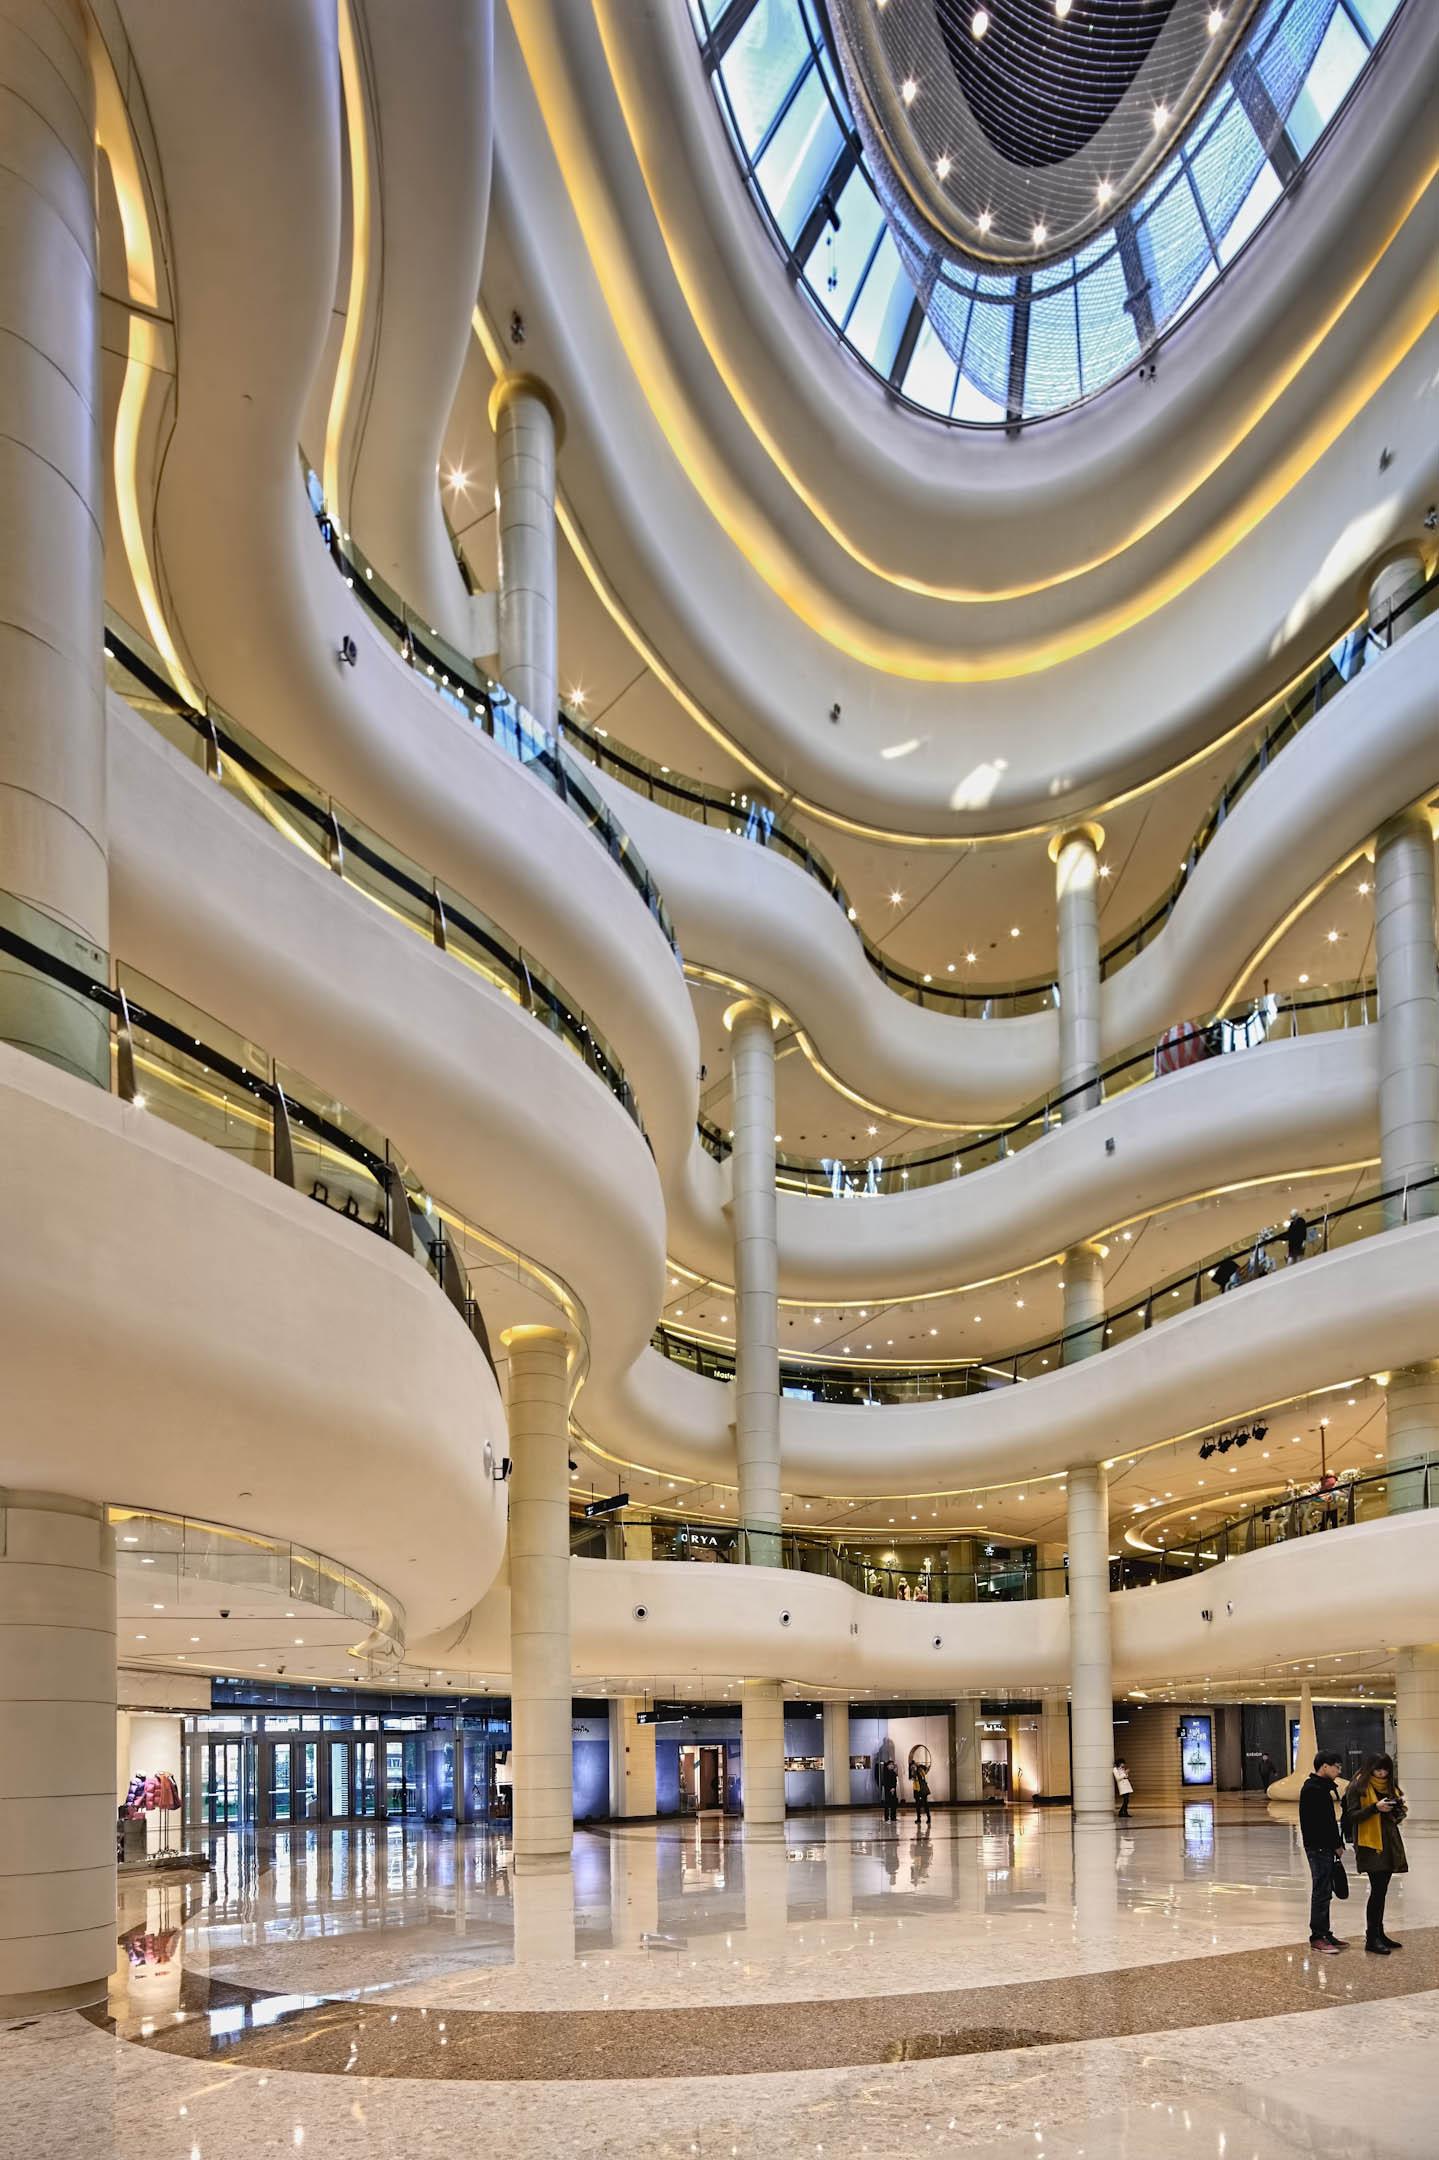 Galaxay Mall / tvsdesign